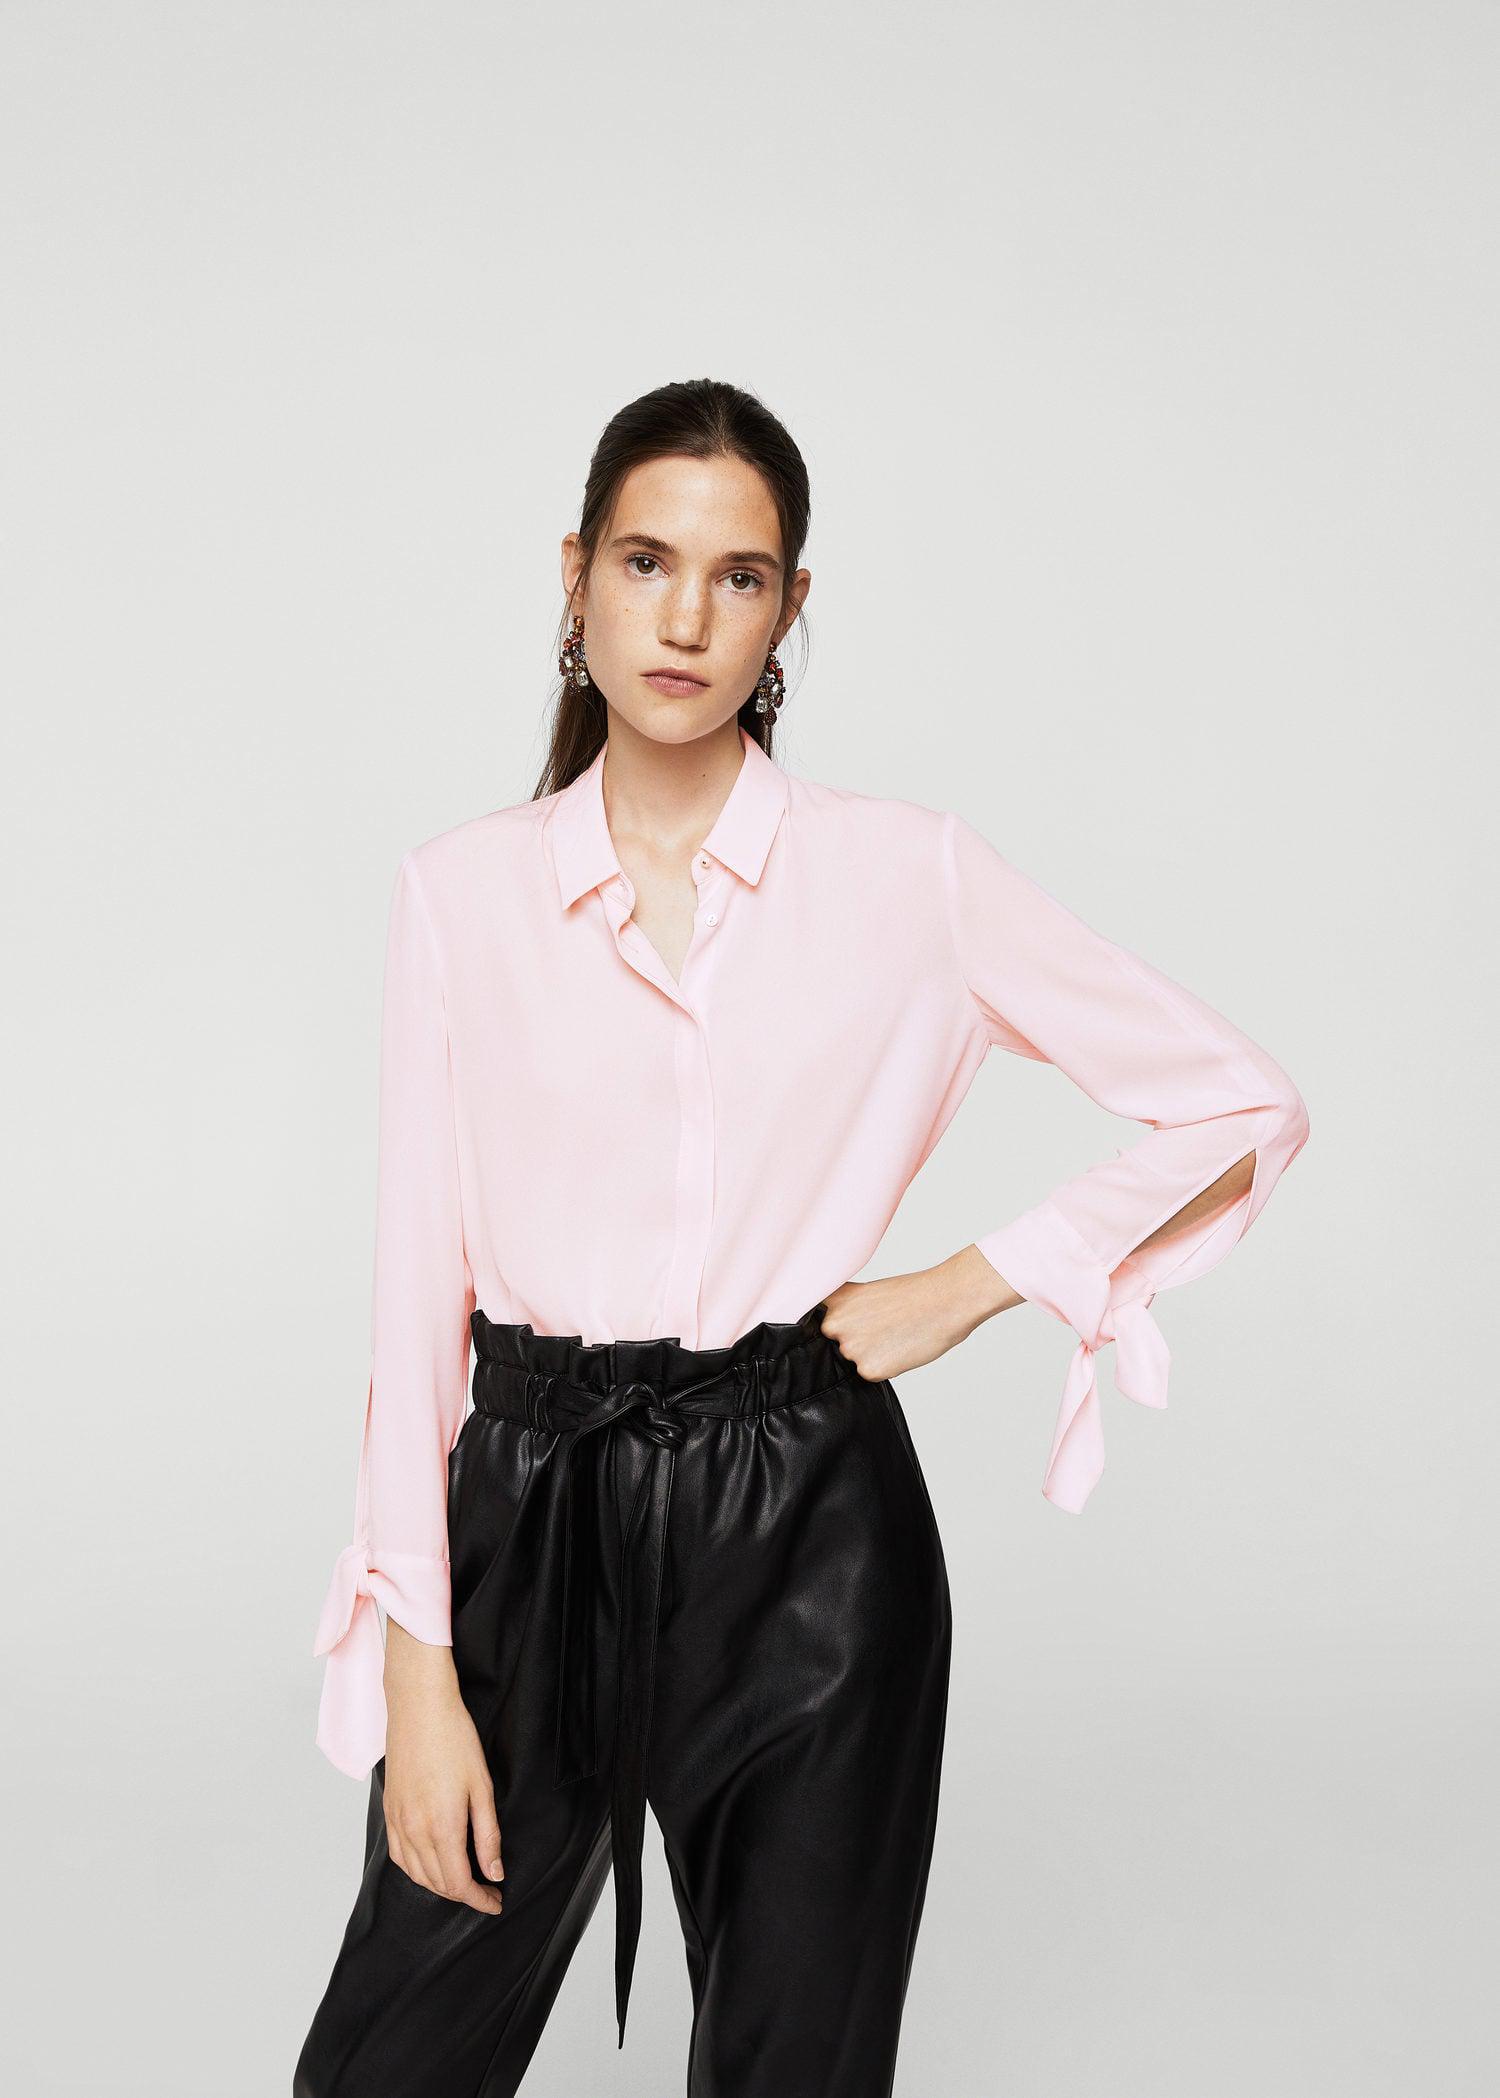 e63fb399bccb4a Mango Buttoned Flowy Shirt in Pink - Lyst